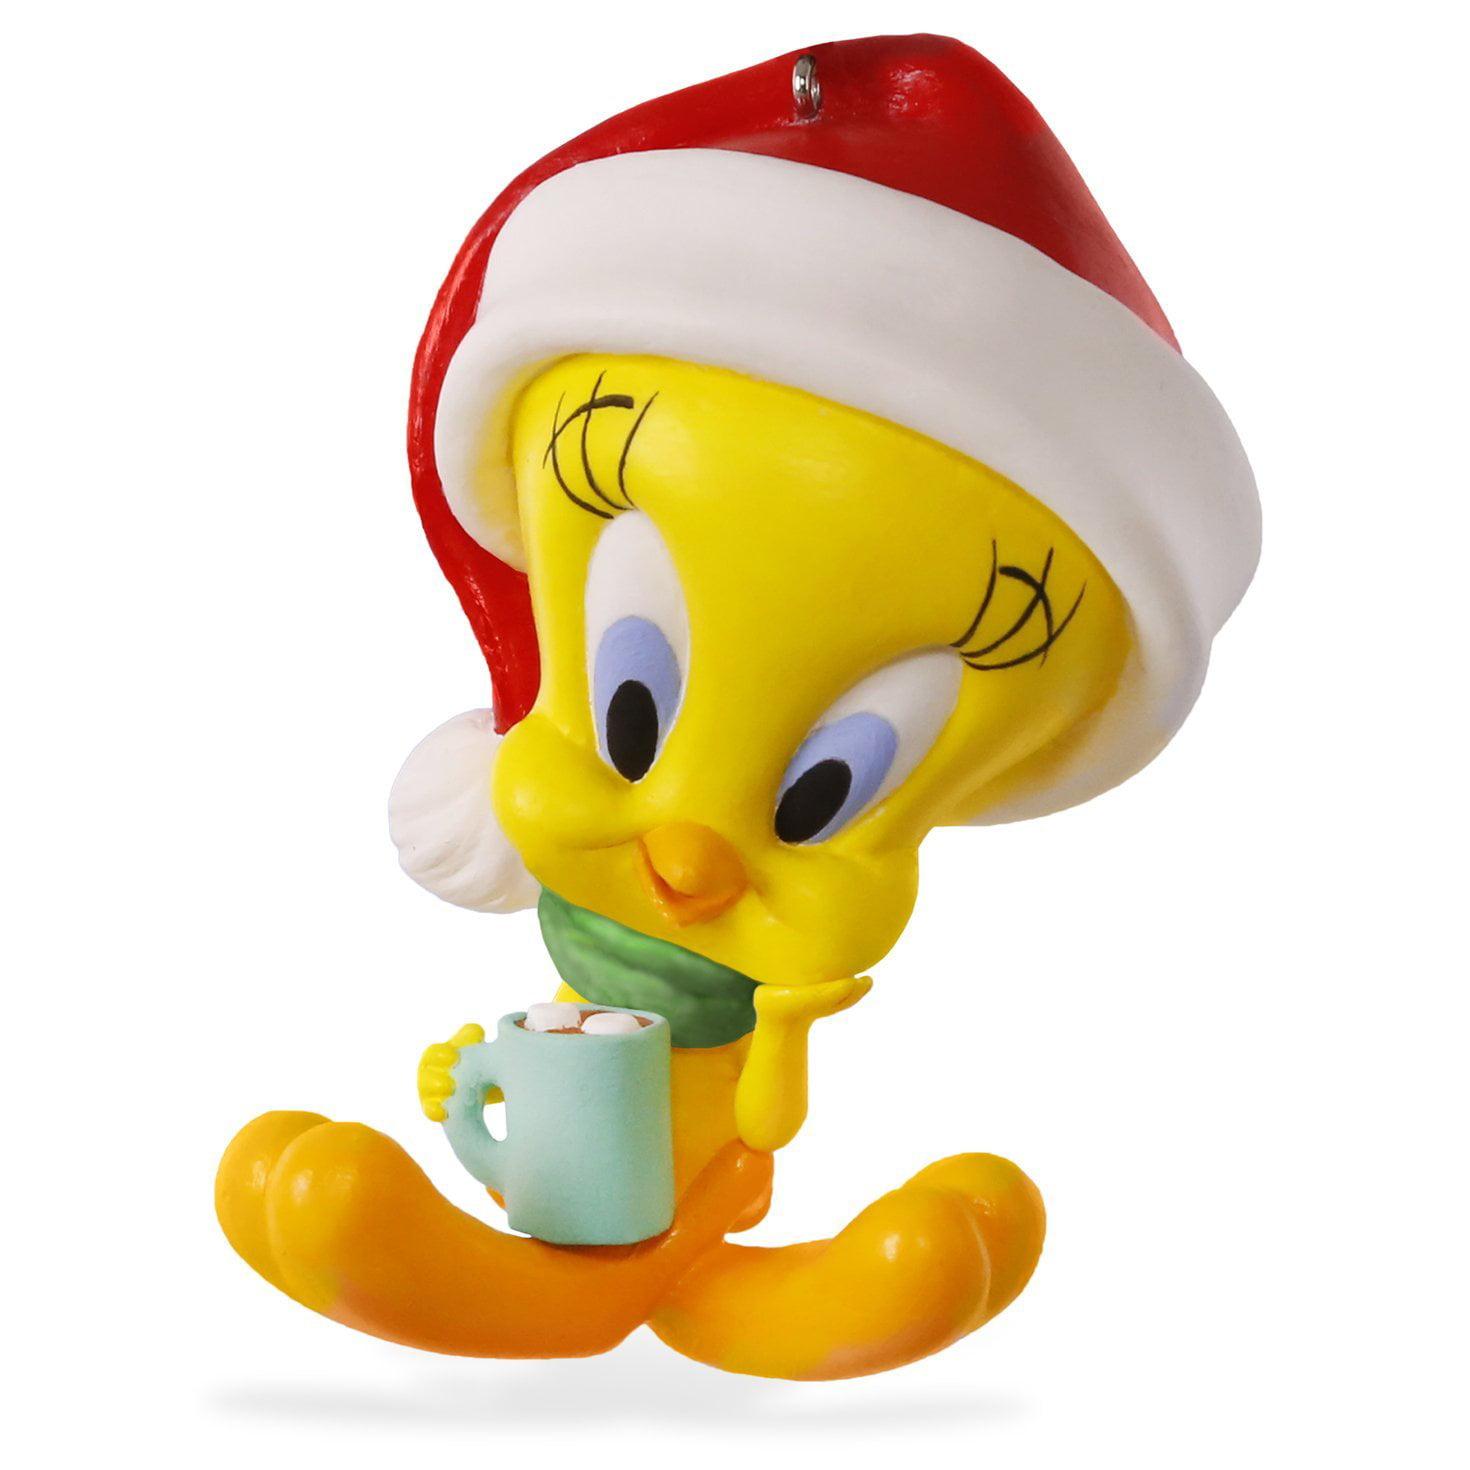 keepsake looney tunes tweety hot cocoa holiday ornament by hallmark walmartcom - Hallmark Christmas Home Decor